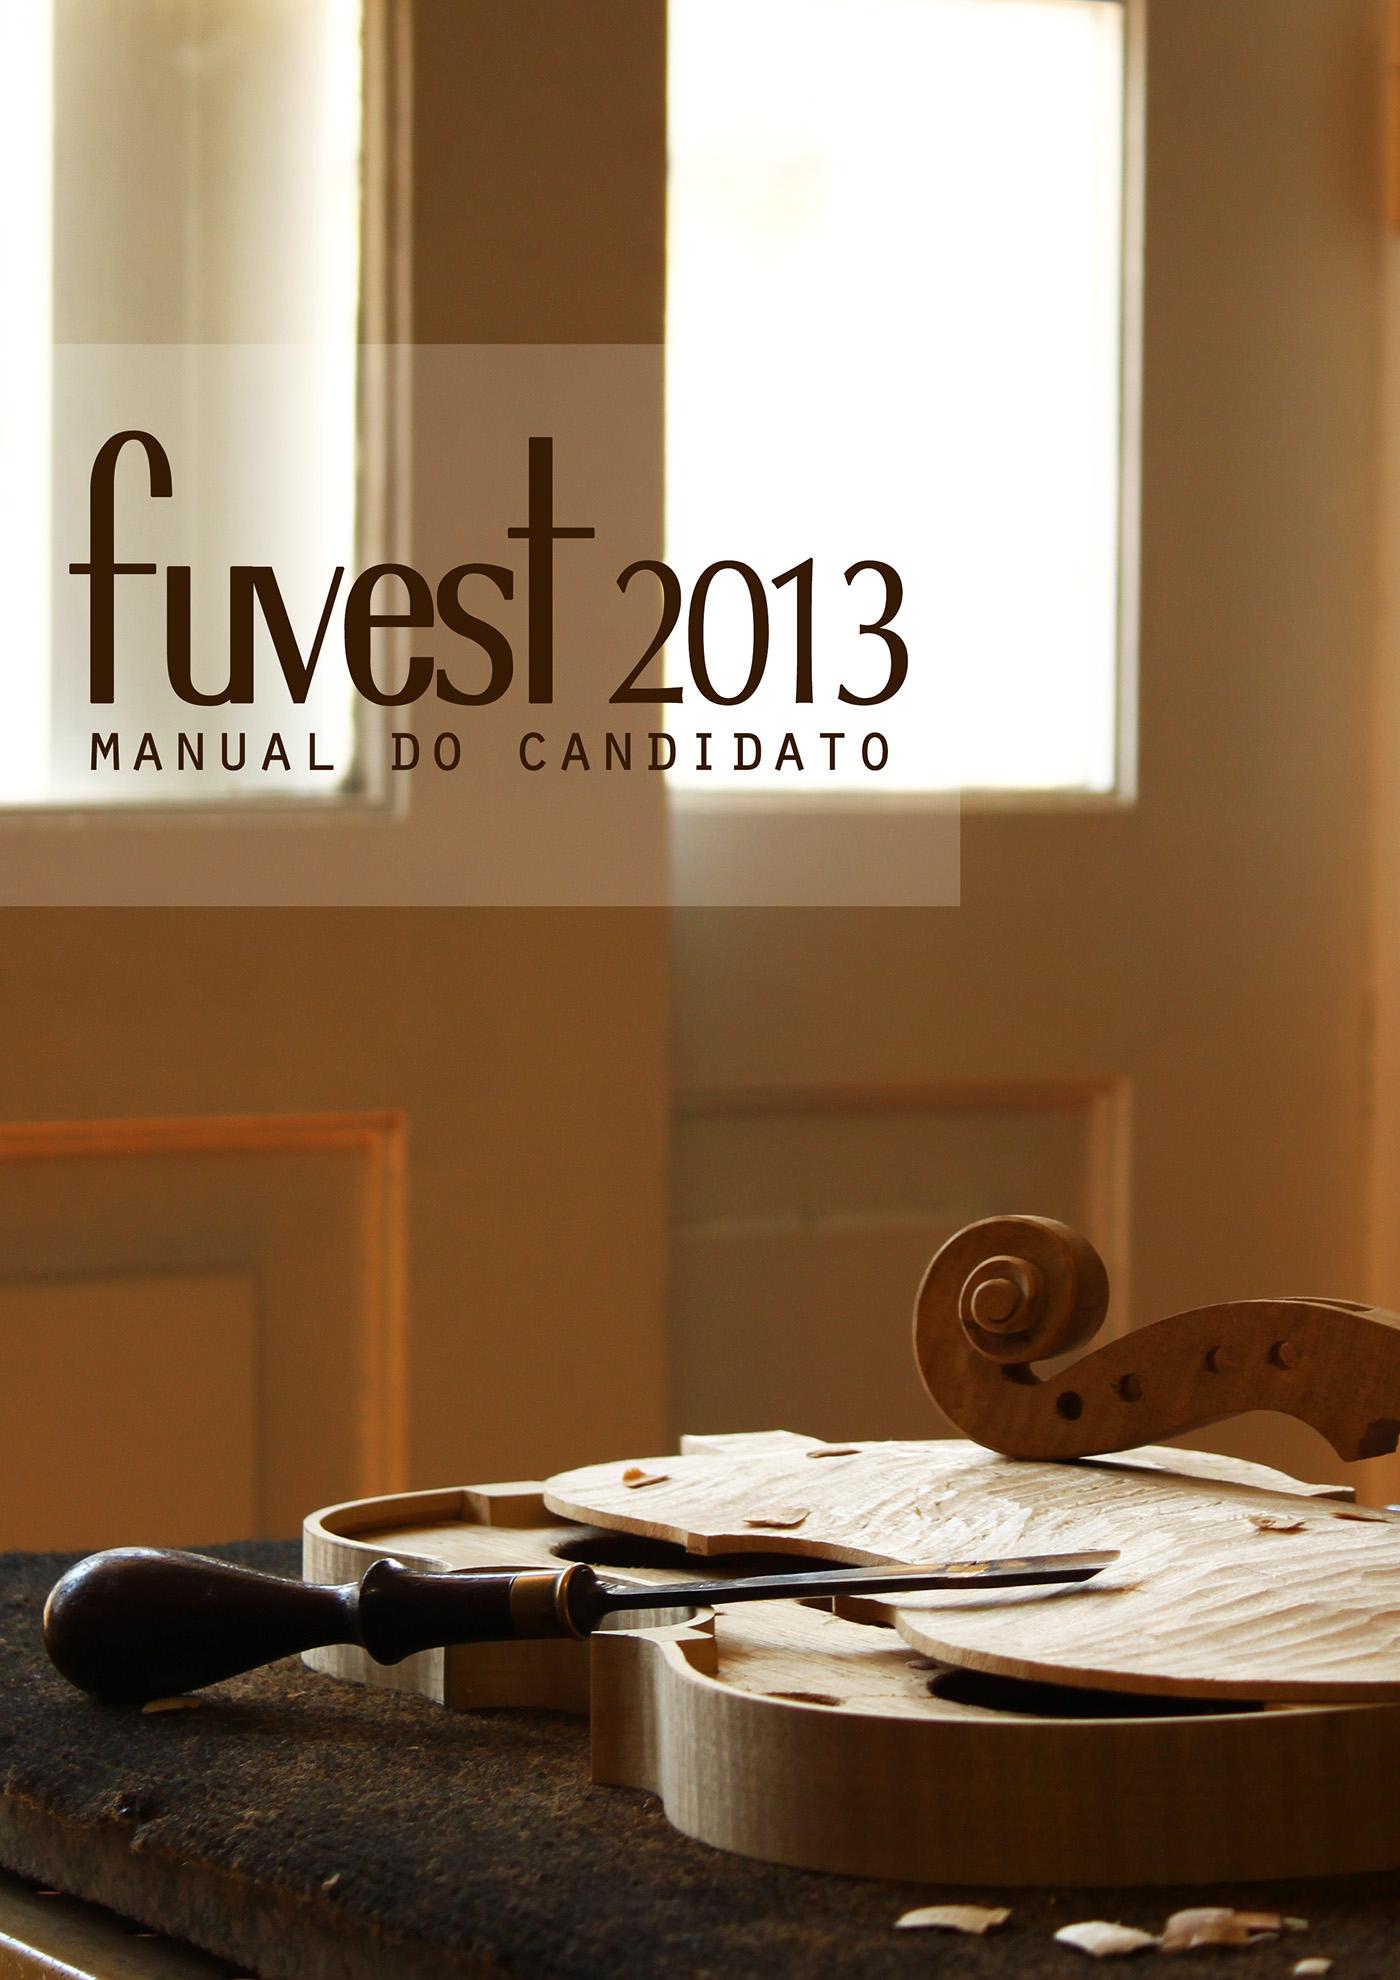 manual da fuvest 2013 on behance rh behance net  Fuvest 2015